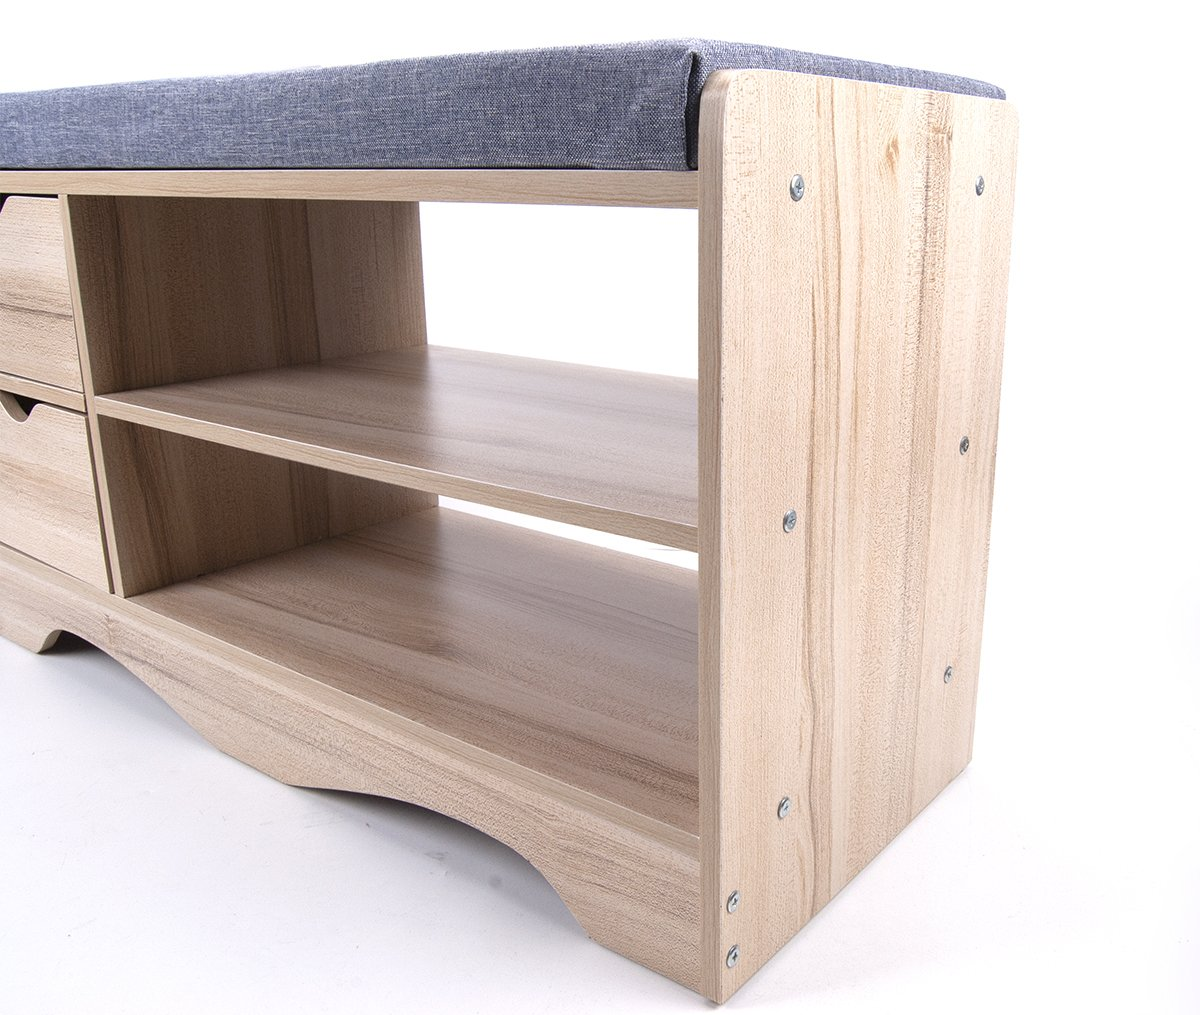 Polar Aurora Storage Bench Storage Hall Wooden Shoe Cabinet with Drawers 2 Level Shoe Storage Rack